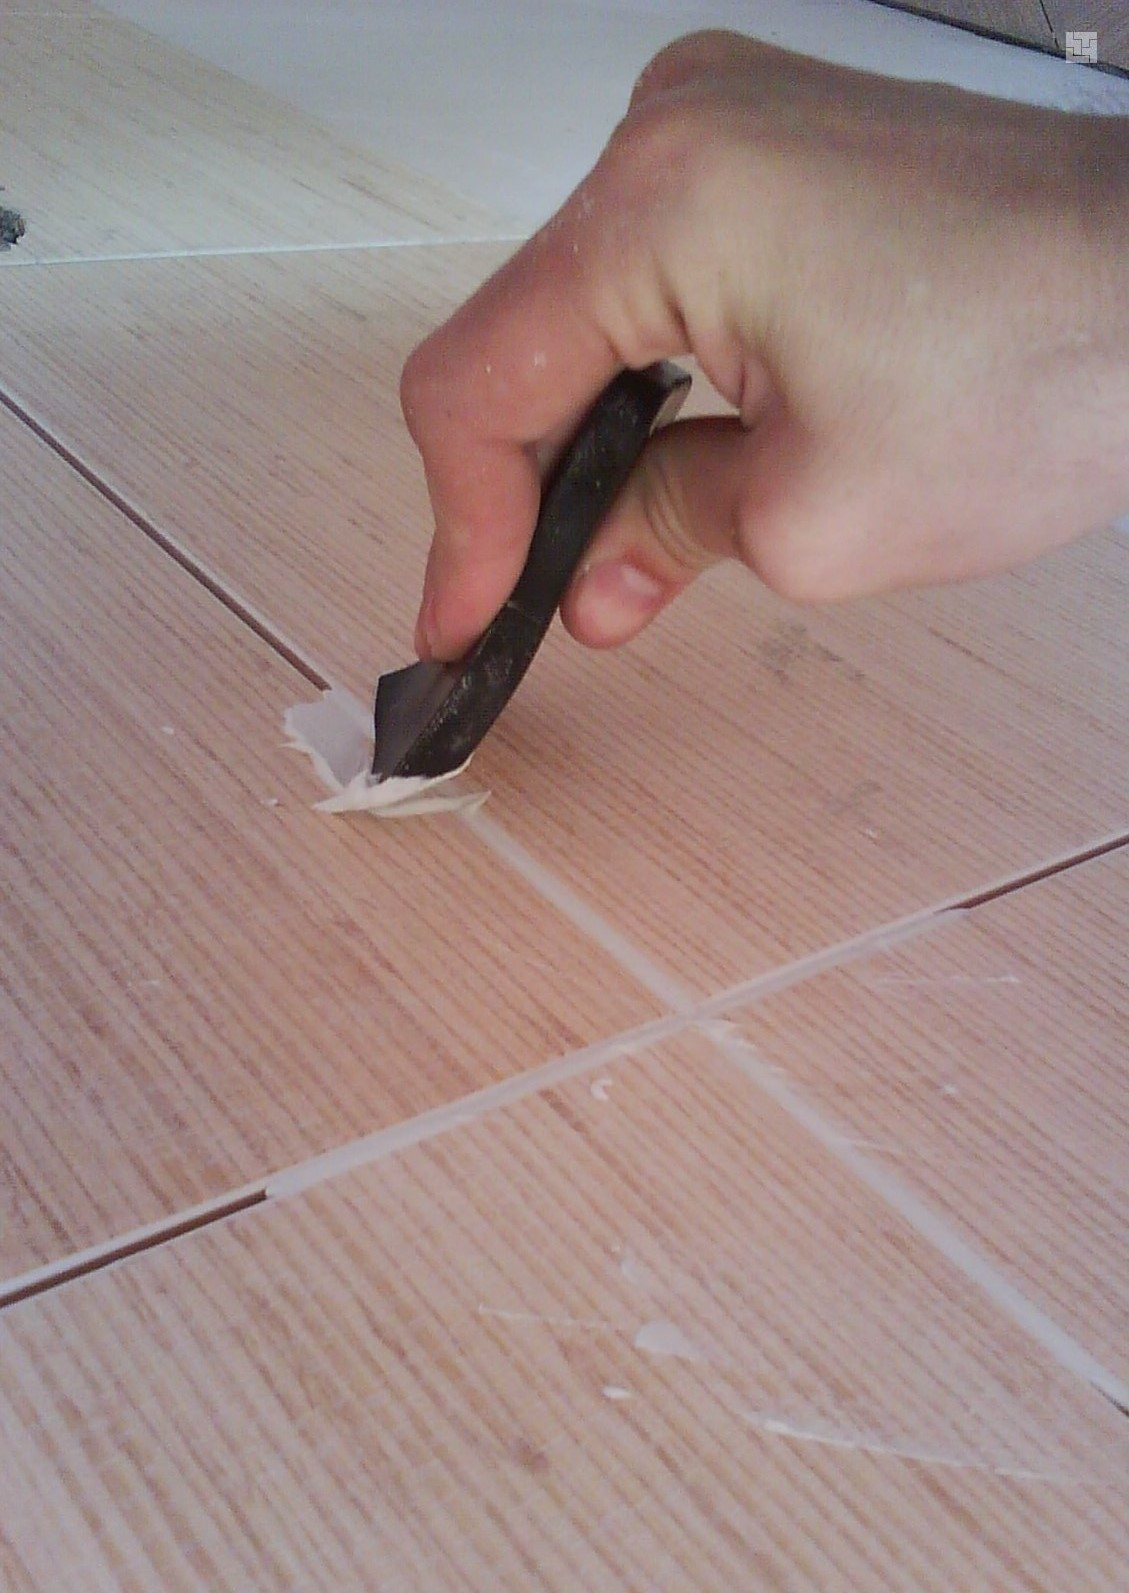 как нанести затирку на плитку для швов